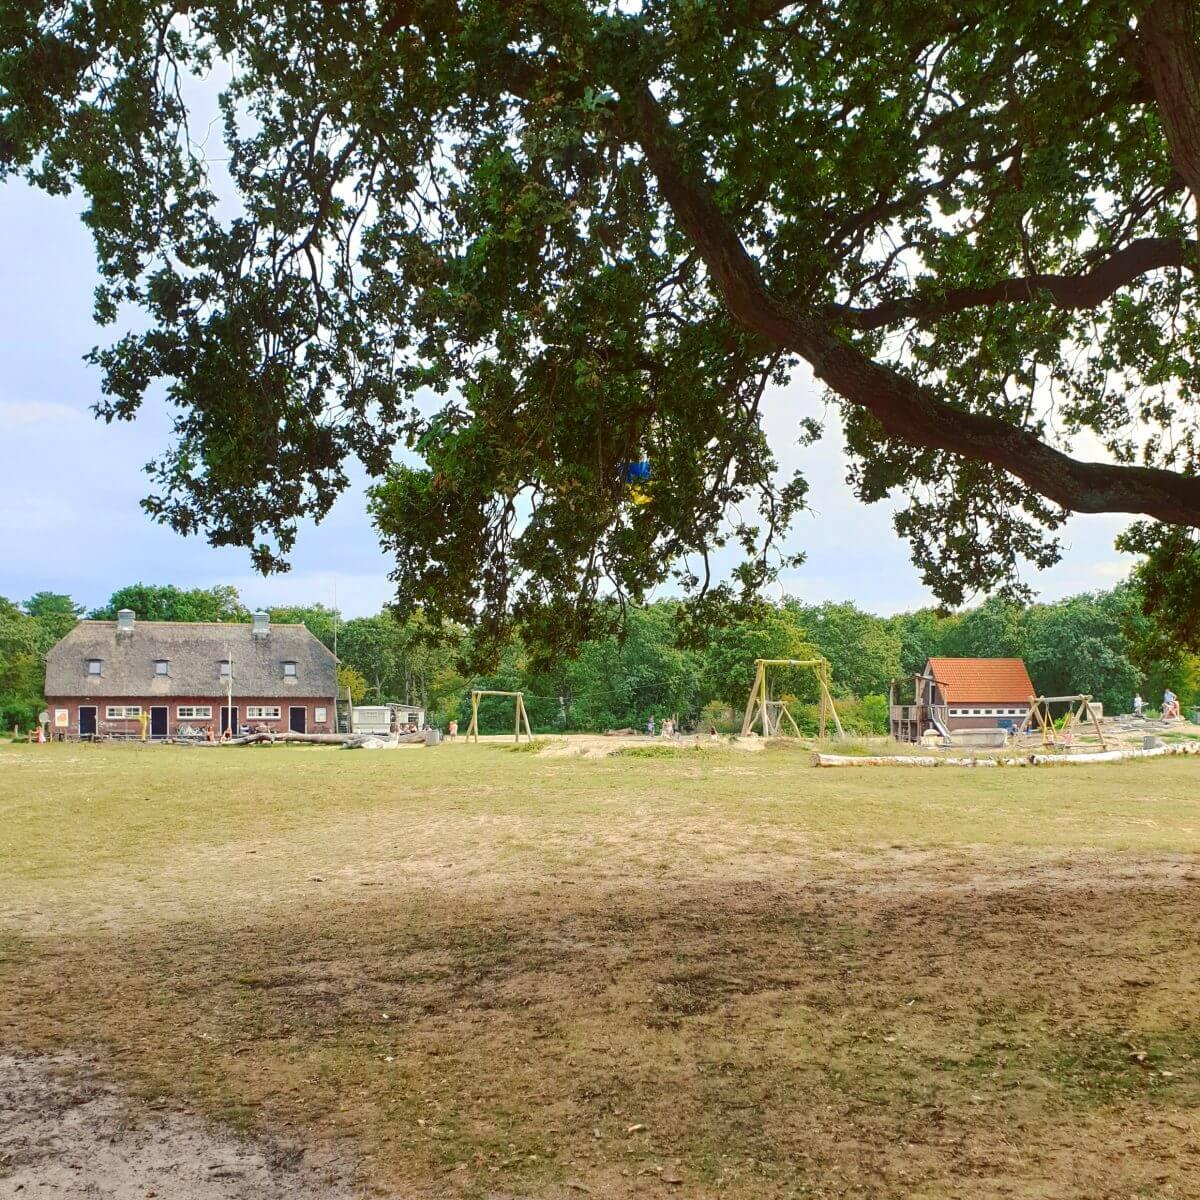 grote speeltuin van camping bakkum